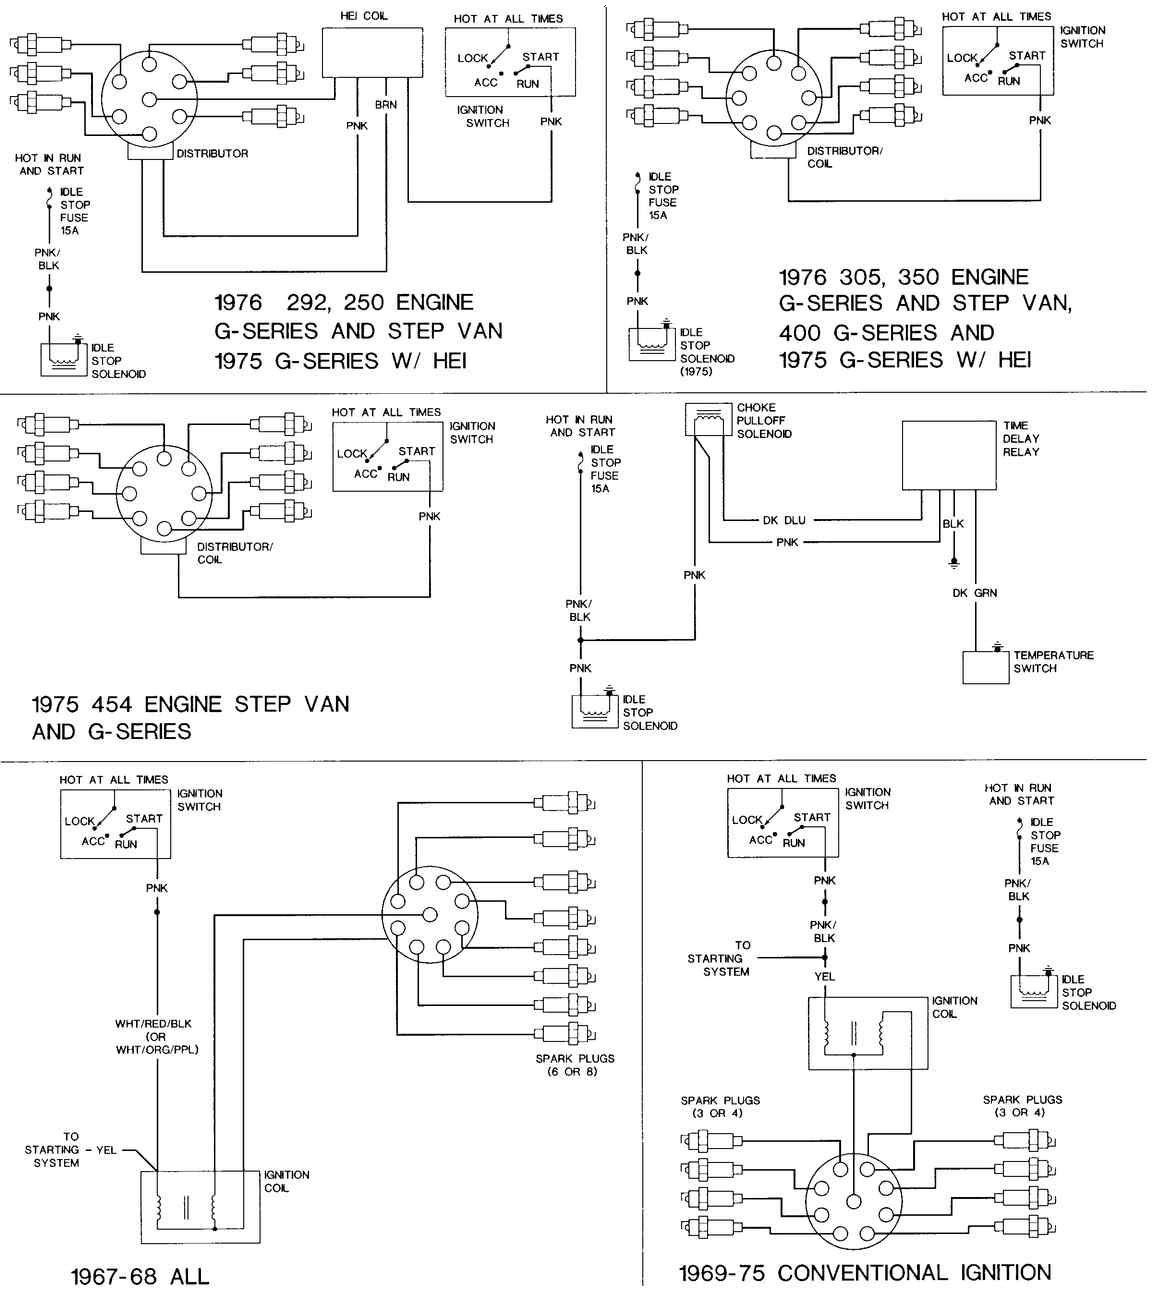 2012 Chevy Sonic Wiring Diagram Wiring Diagrams Data Digital A Digital A Ungiaggioloincucina It